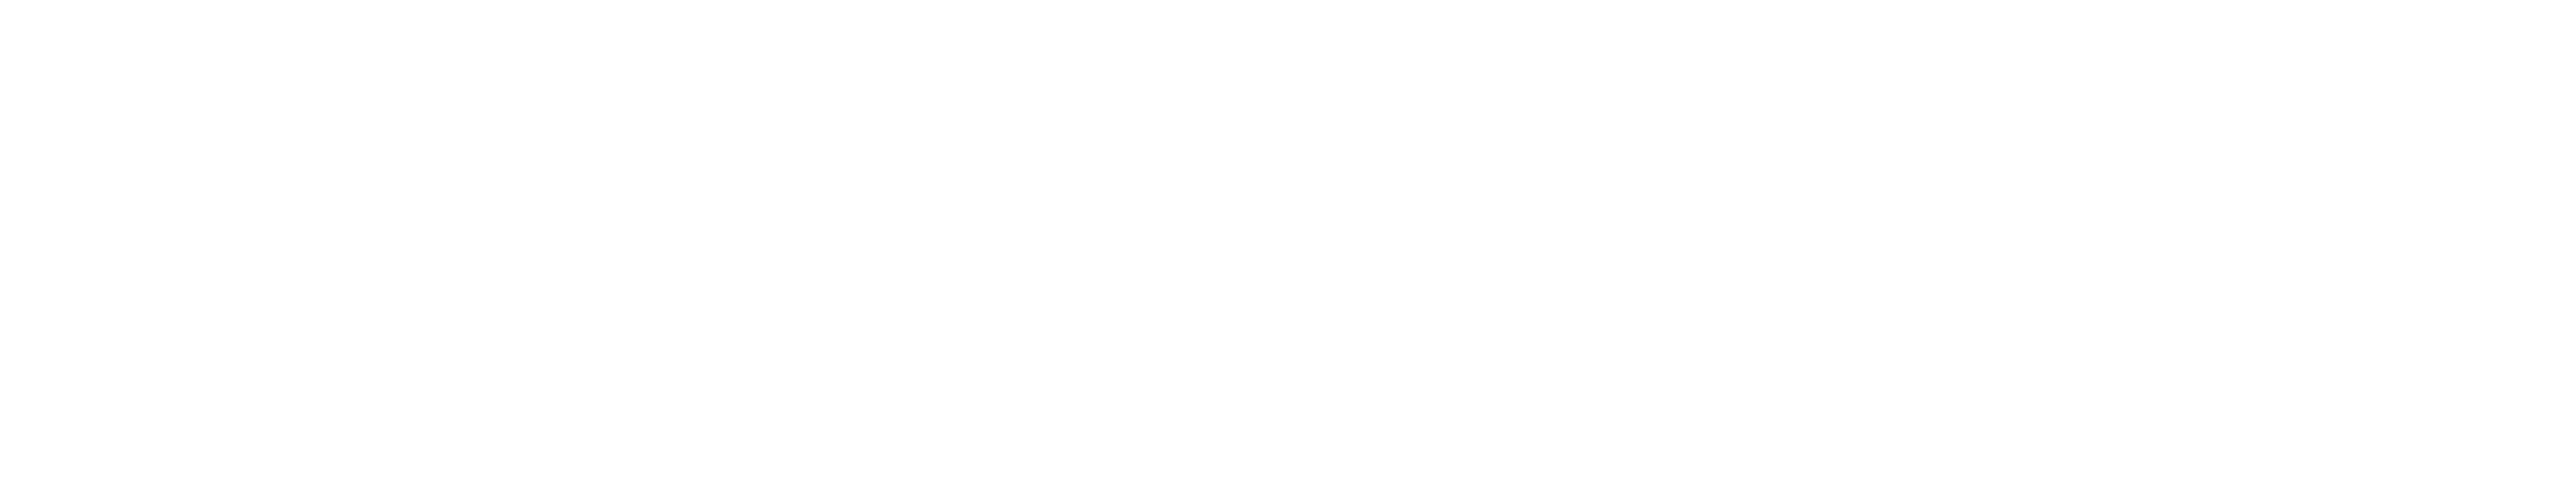 ferdinand_ascher-logo_2016-02